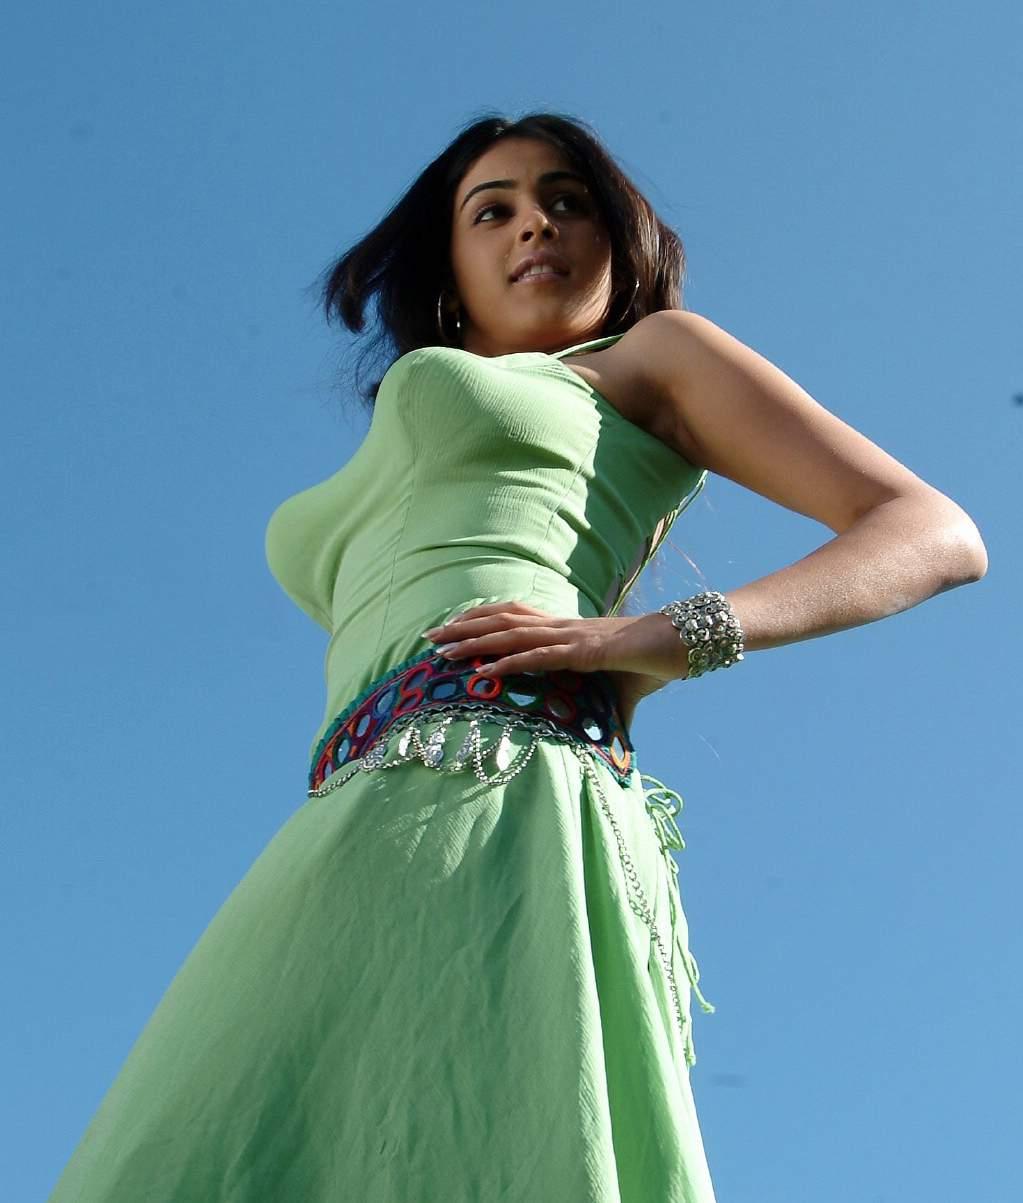 Genelia DSouza Latest Hot Photos - DESI NUDE ALBUM